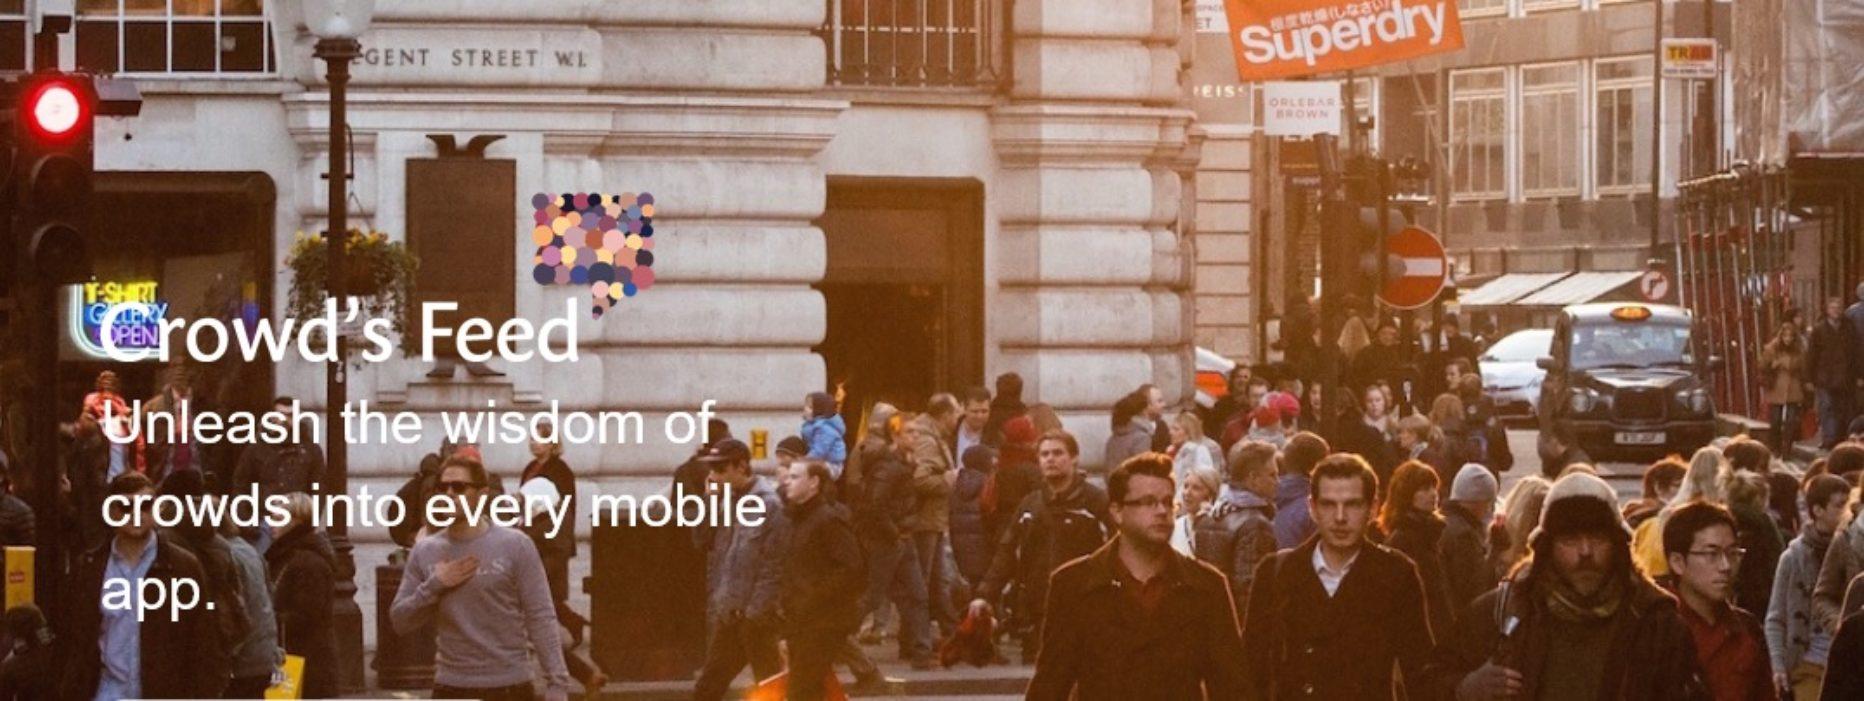 Crowd's Feed – A New Social Media Platform